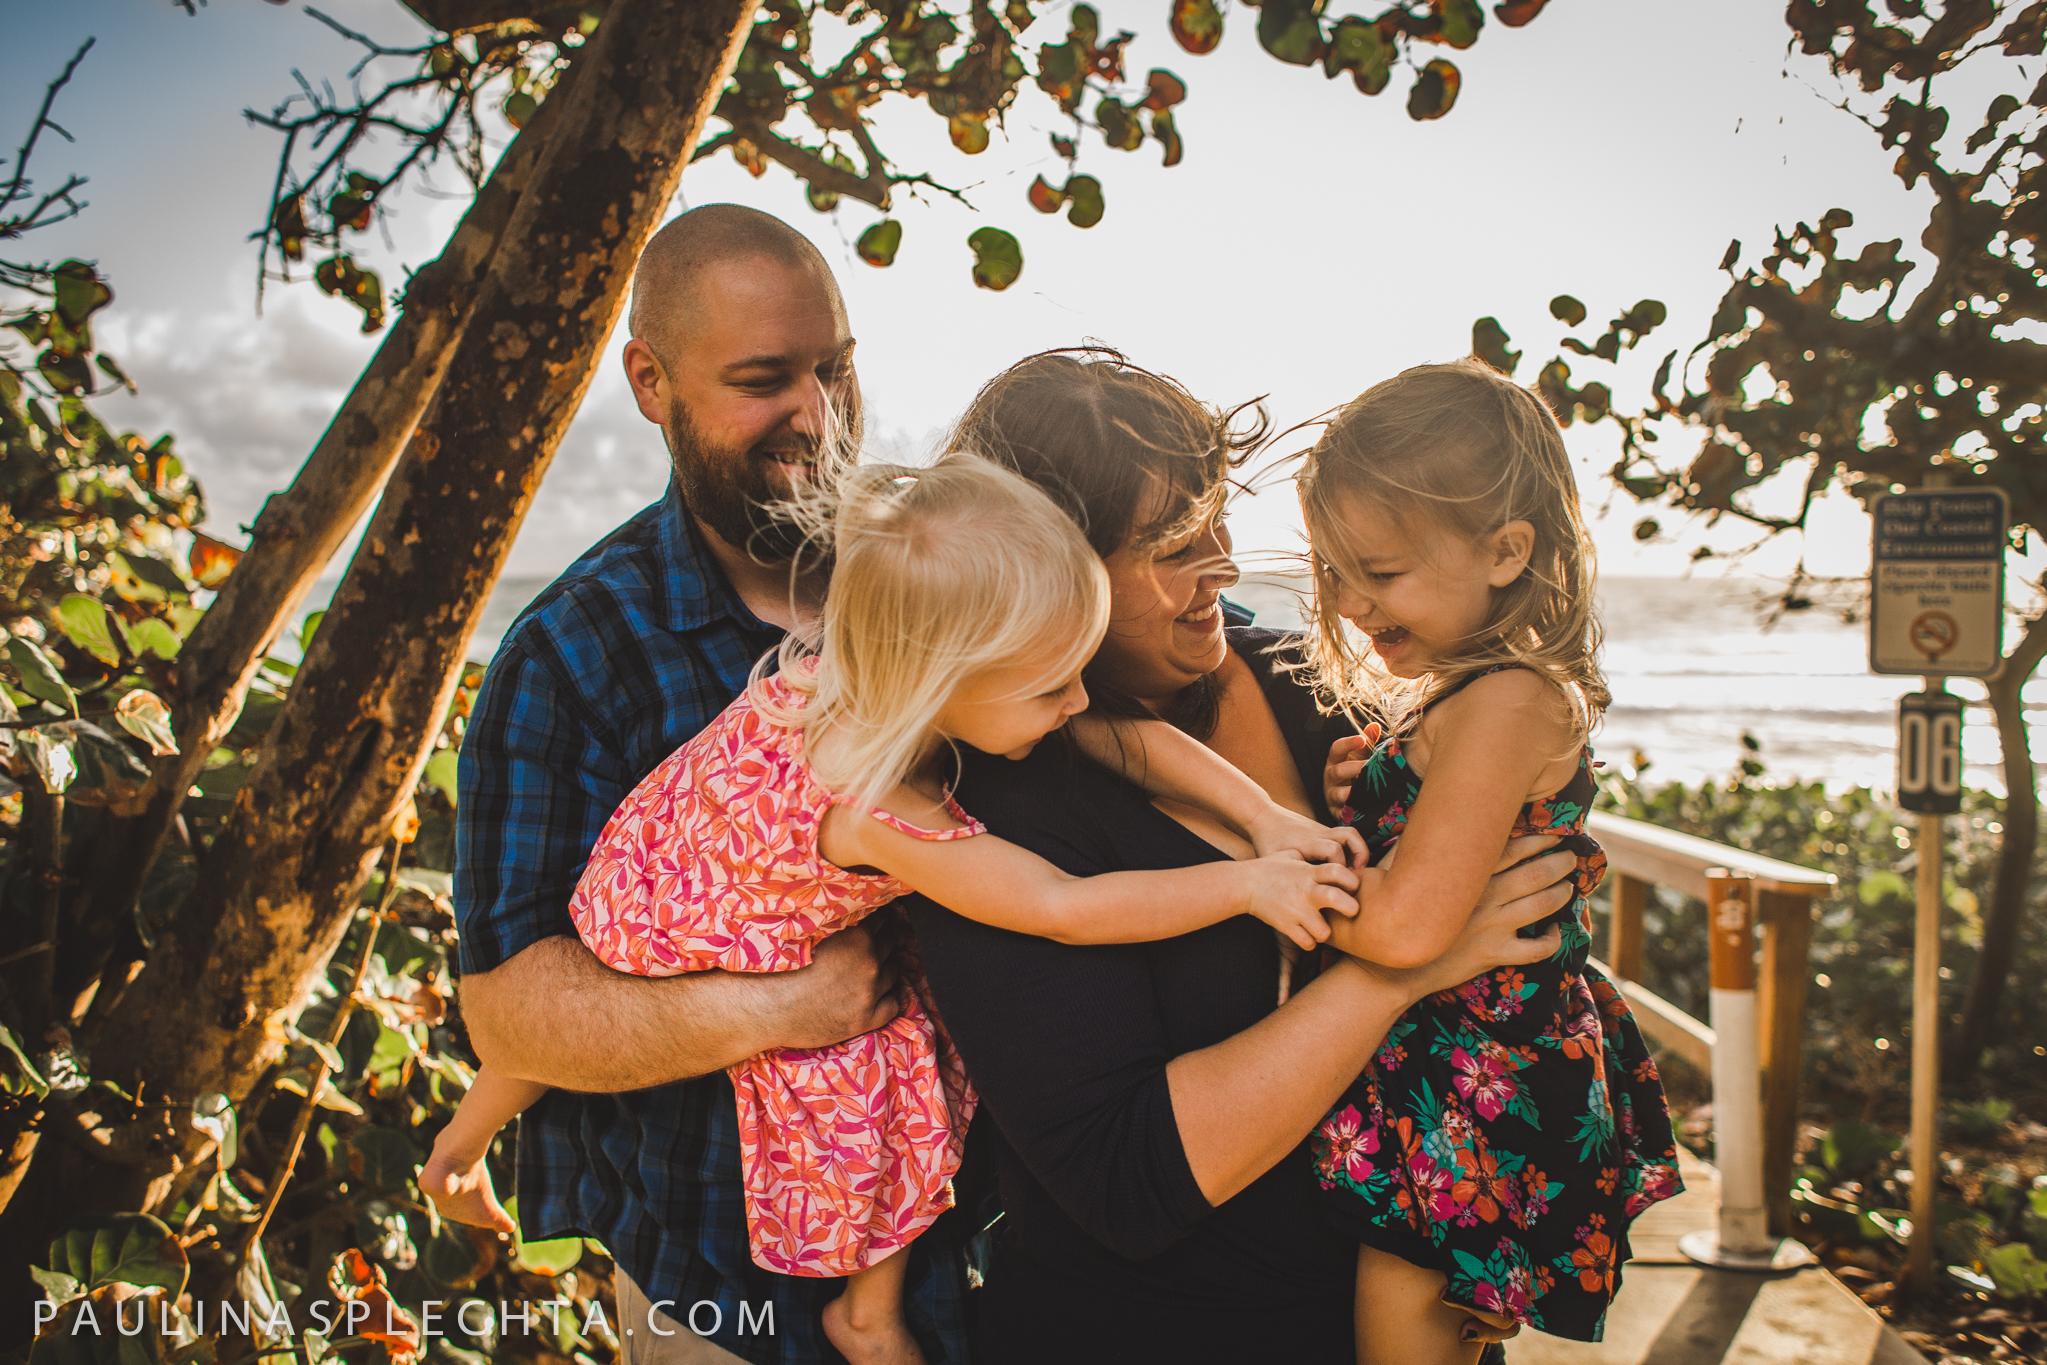 Family Photographer South Florida Pompano Broward Palm Beach Babies Baby Newborn Breastfeeding Birth Photograpy Beach Home Documentary Session-64.jpg